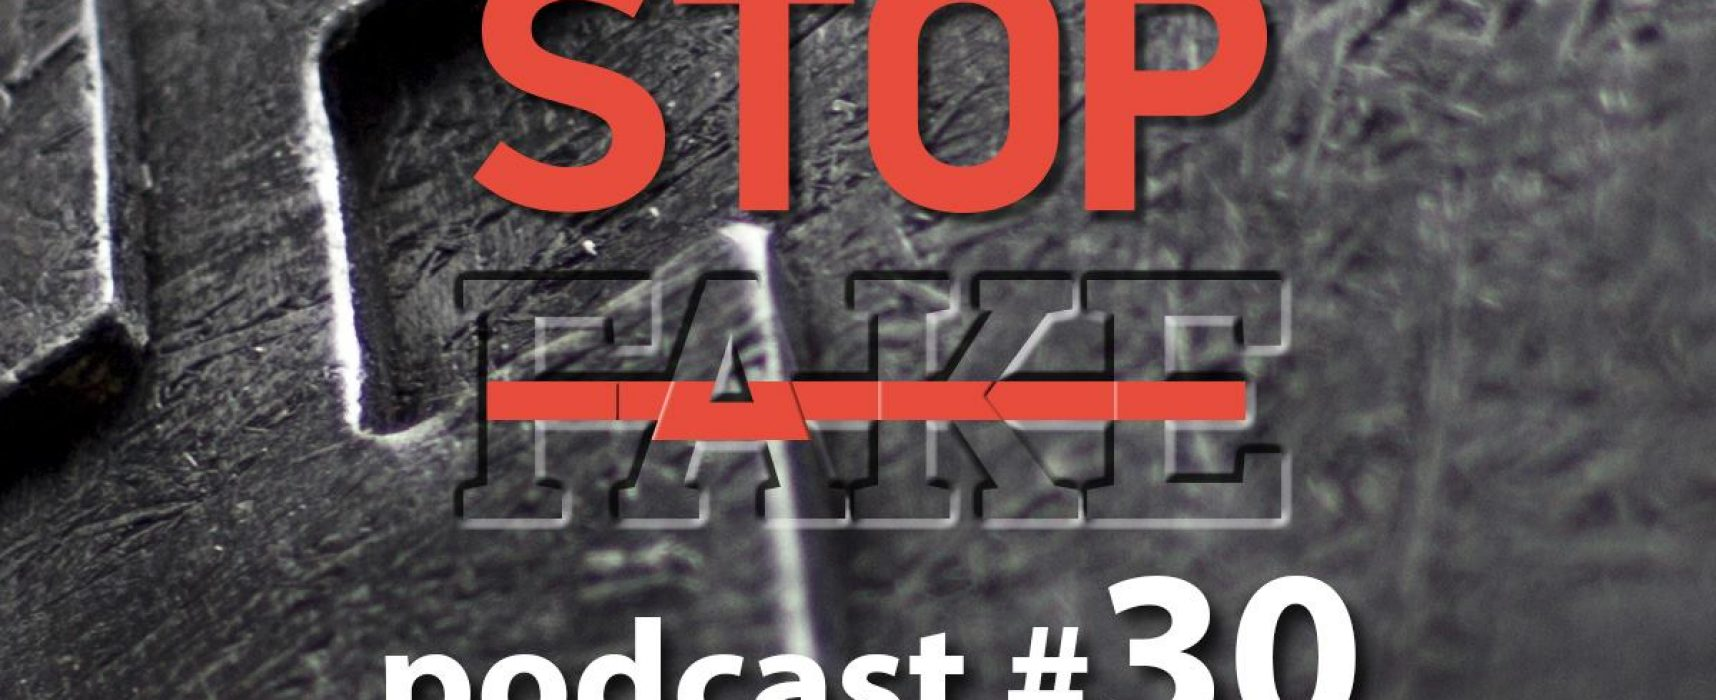 StopFake podcast #30